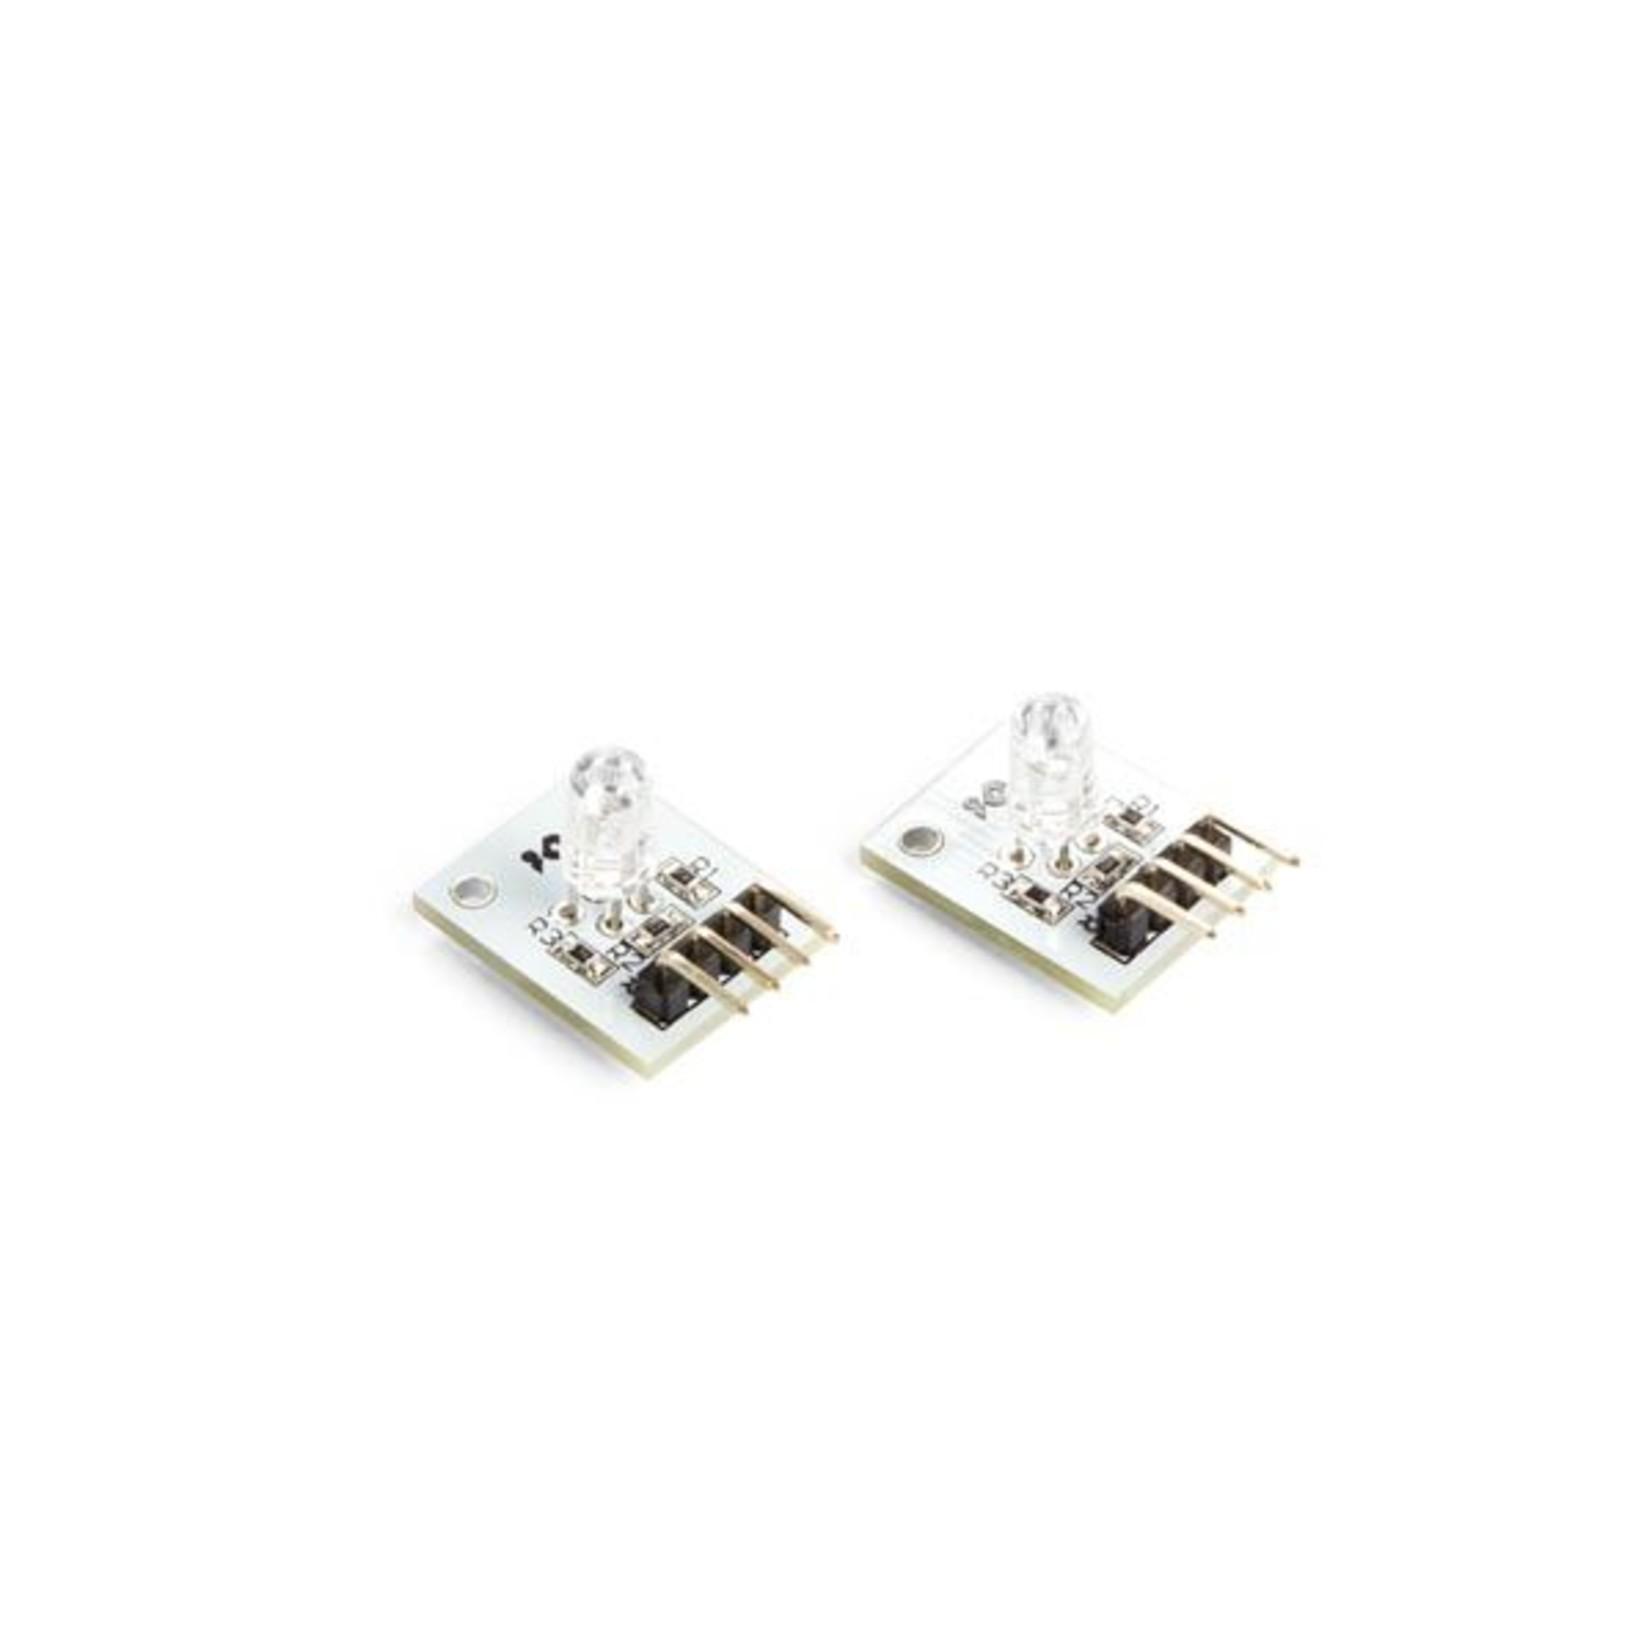 Velleman ARDUINO® compatibele RGB LED-module (2 st.)